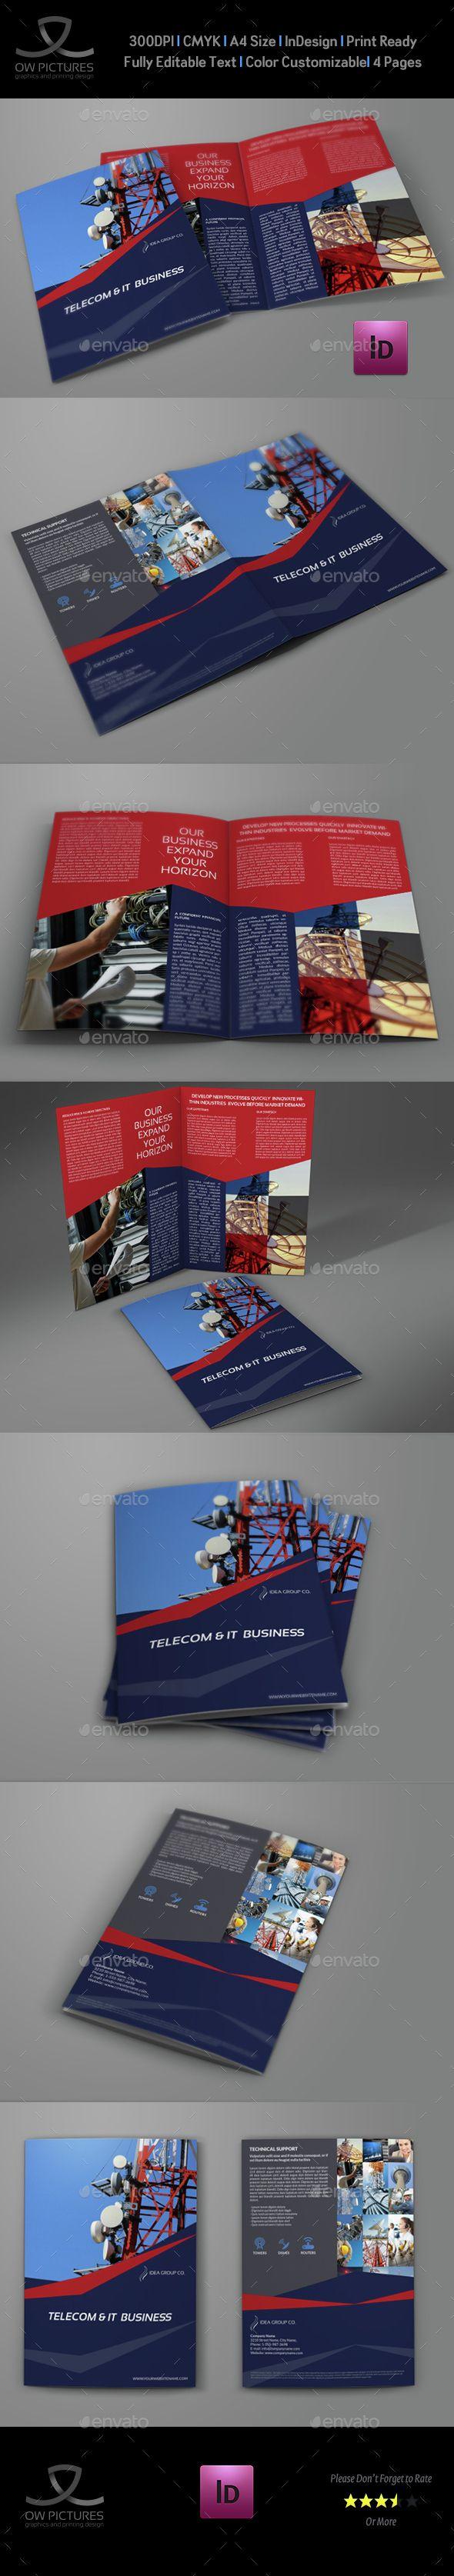 85 best Bi-Fold Brochure images on Pinterest | Brochure template ...